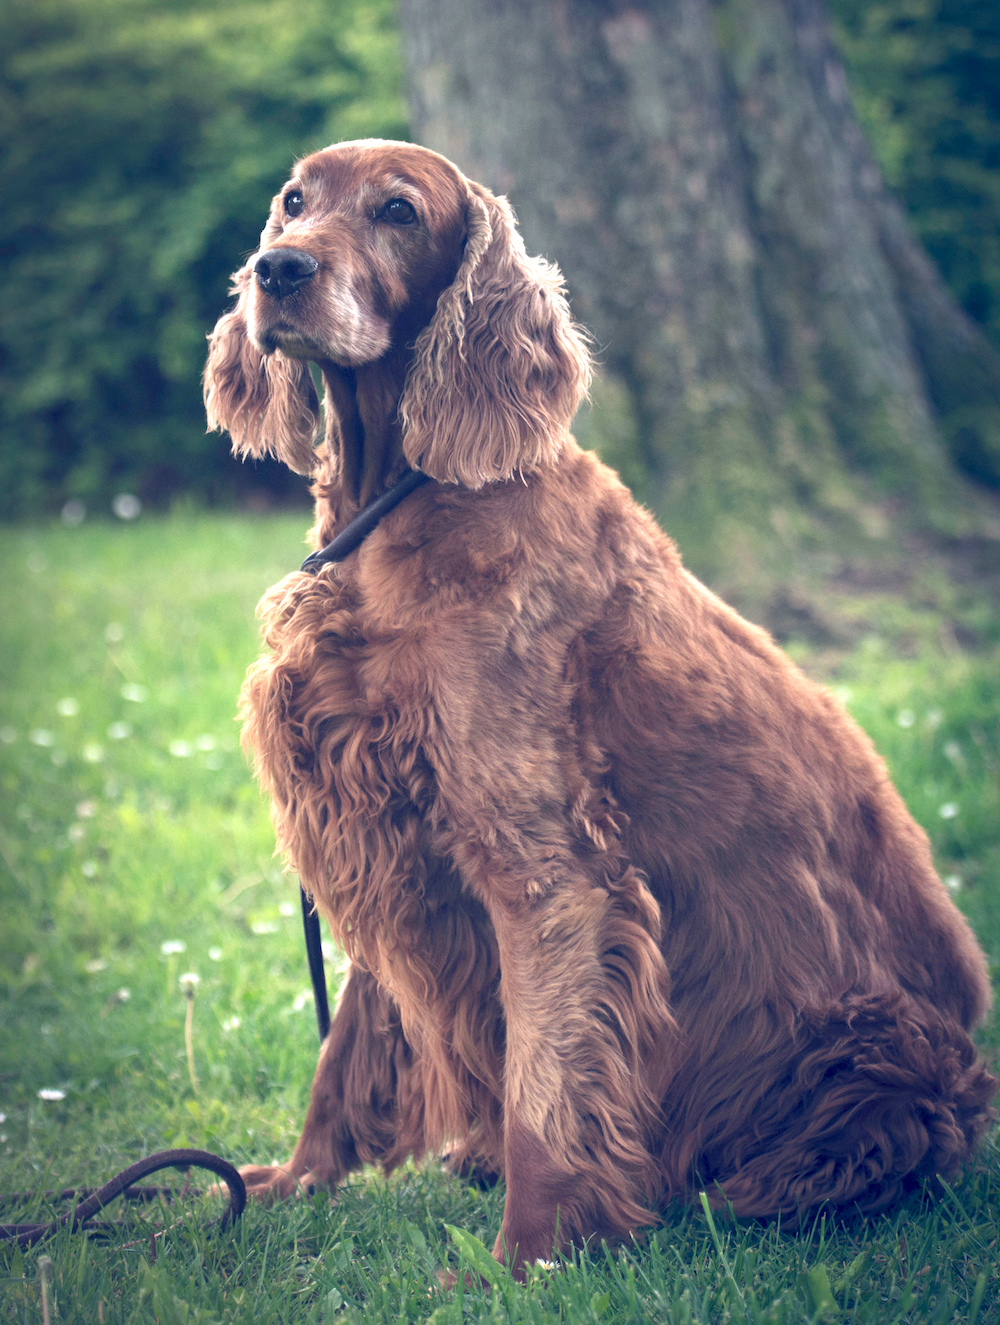 Irish setter dog sitting in park